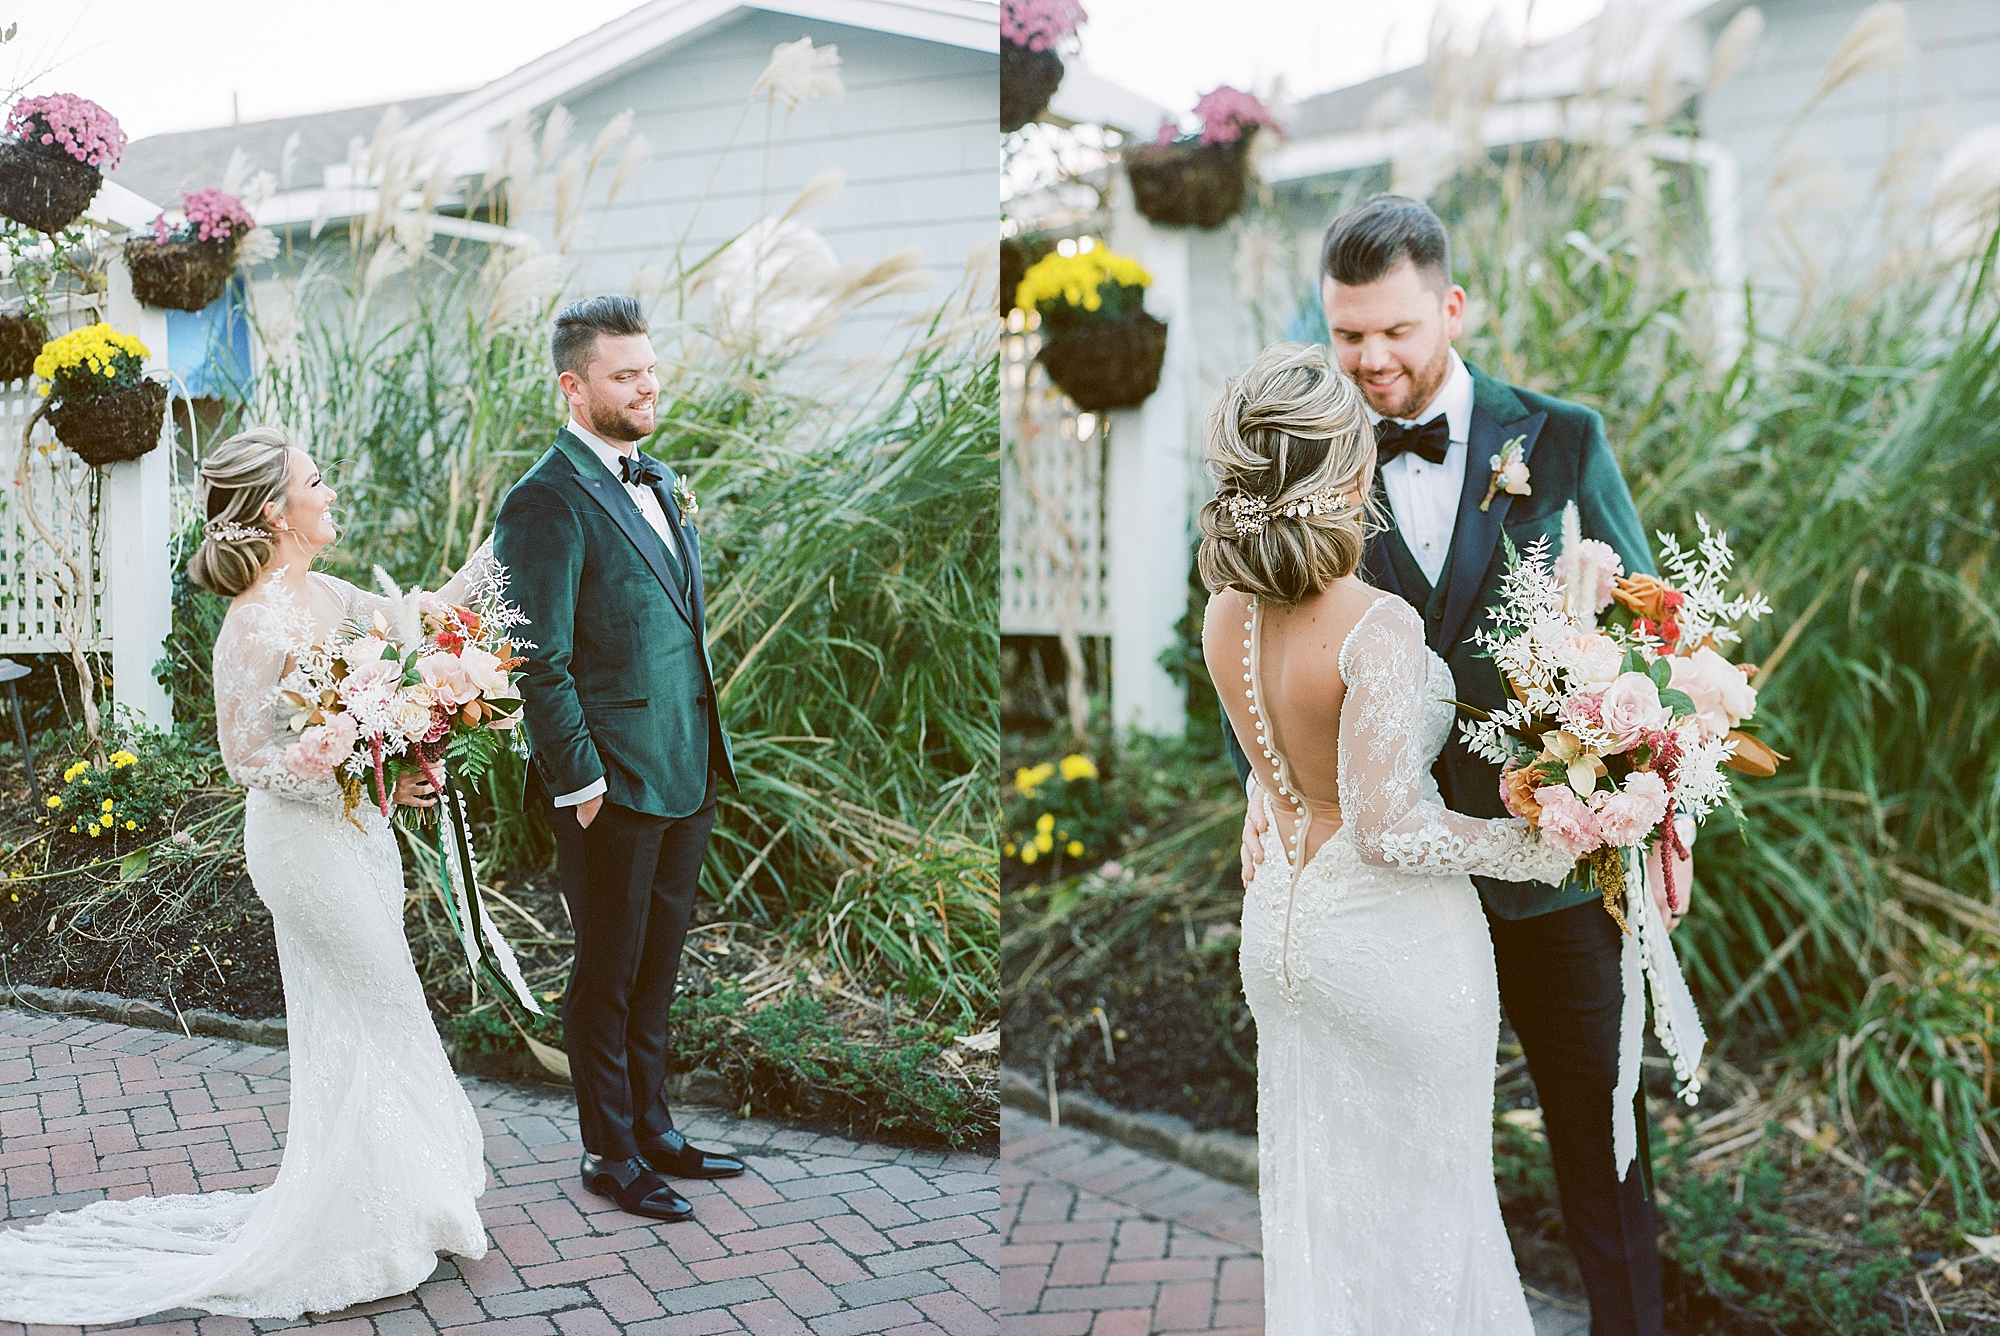 Bonnet Island Estate Film Wedding Photography by Magdalena Studios 0025